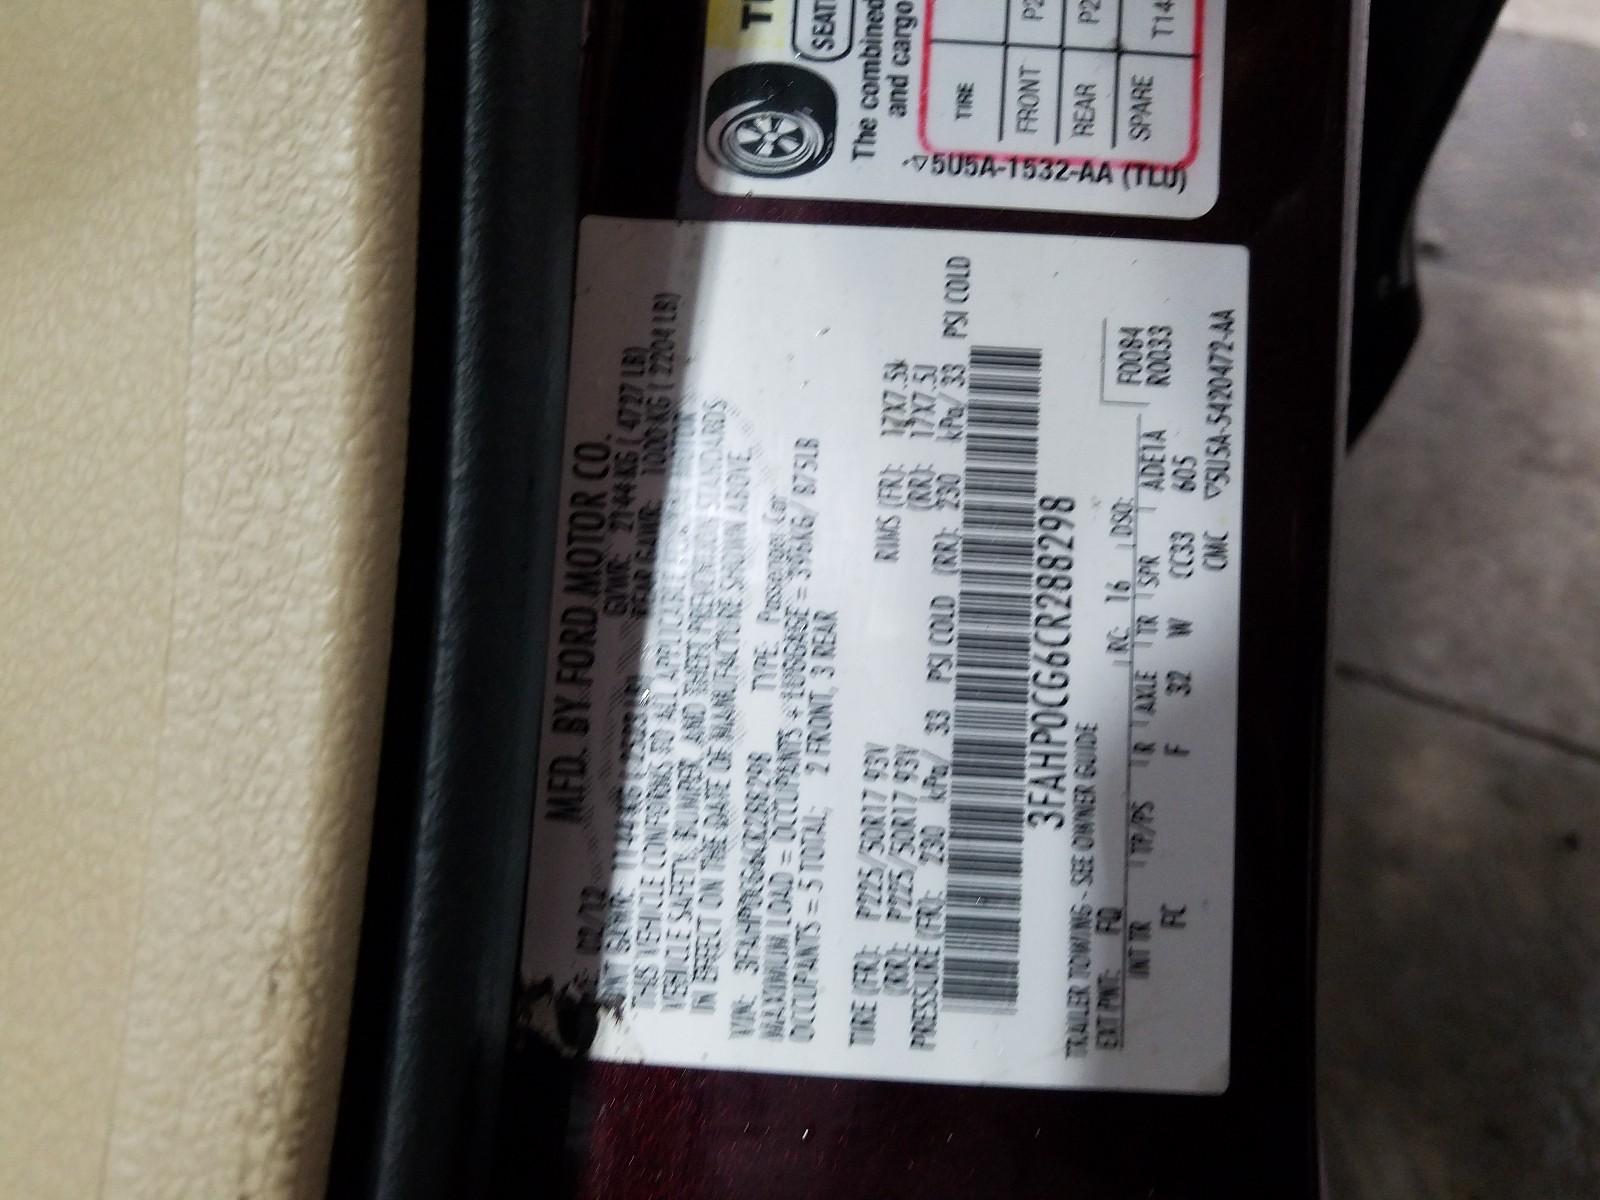 3FAHP0CG6CR288298 - 2012 Ford Fusion Sel 3.0L